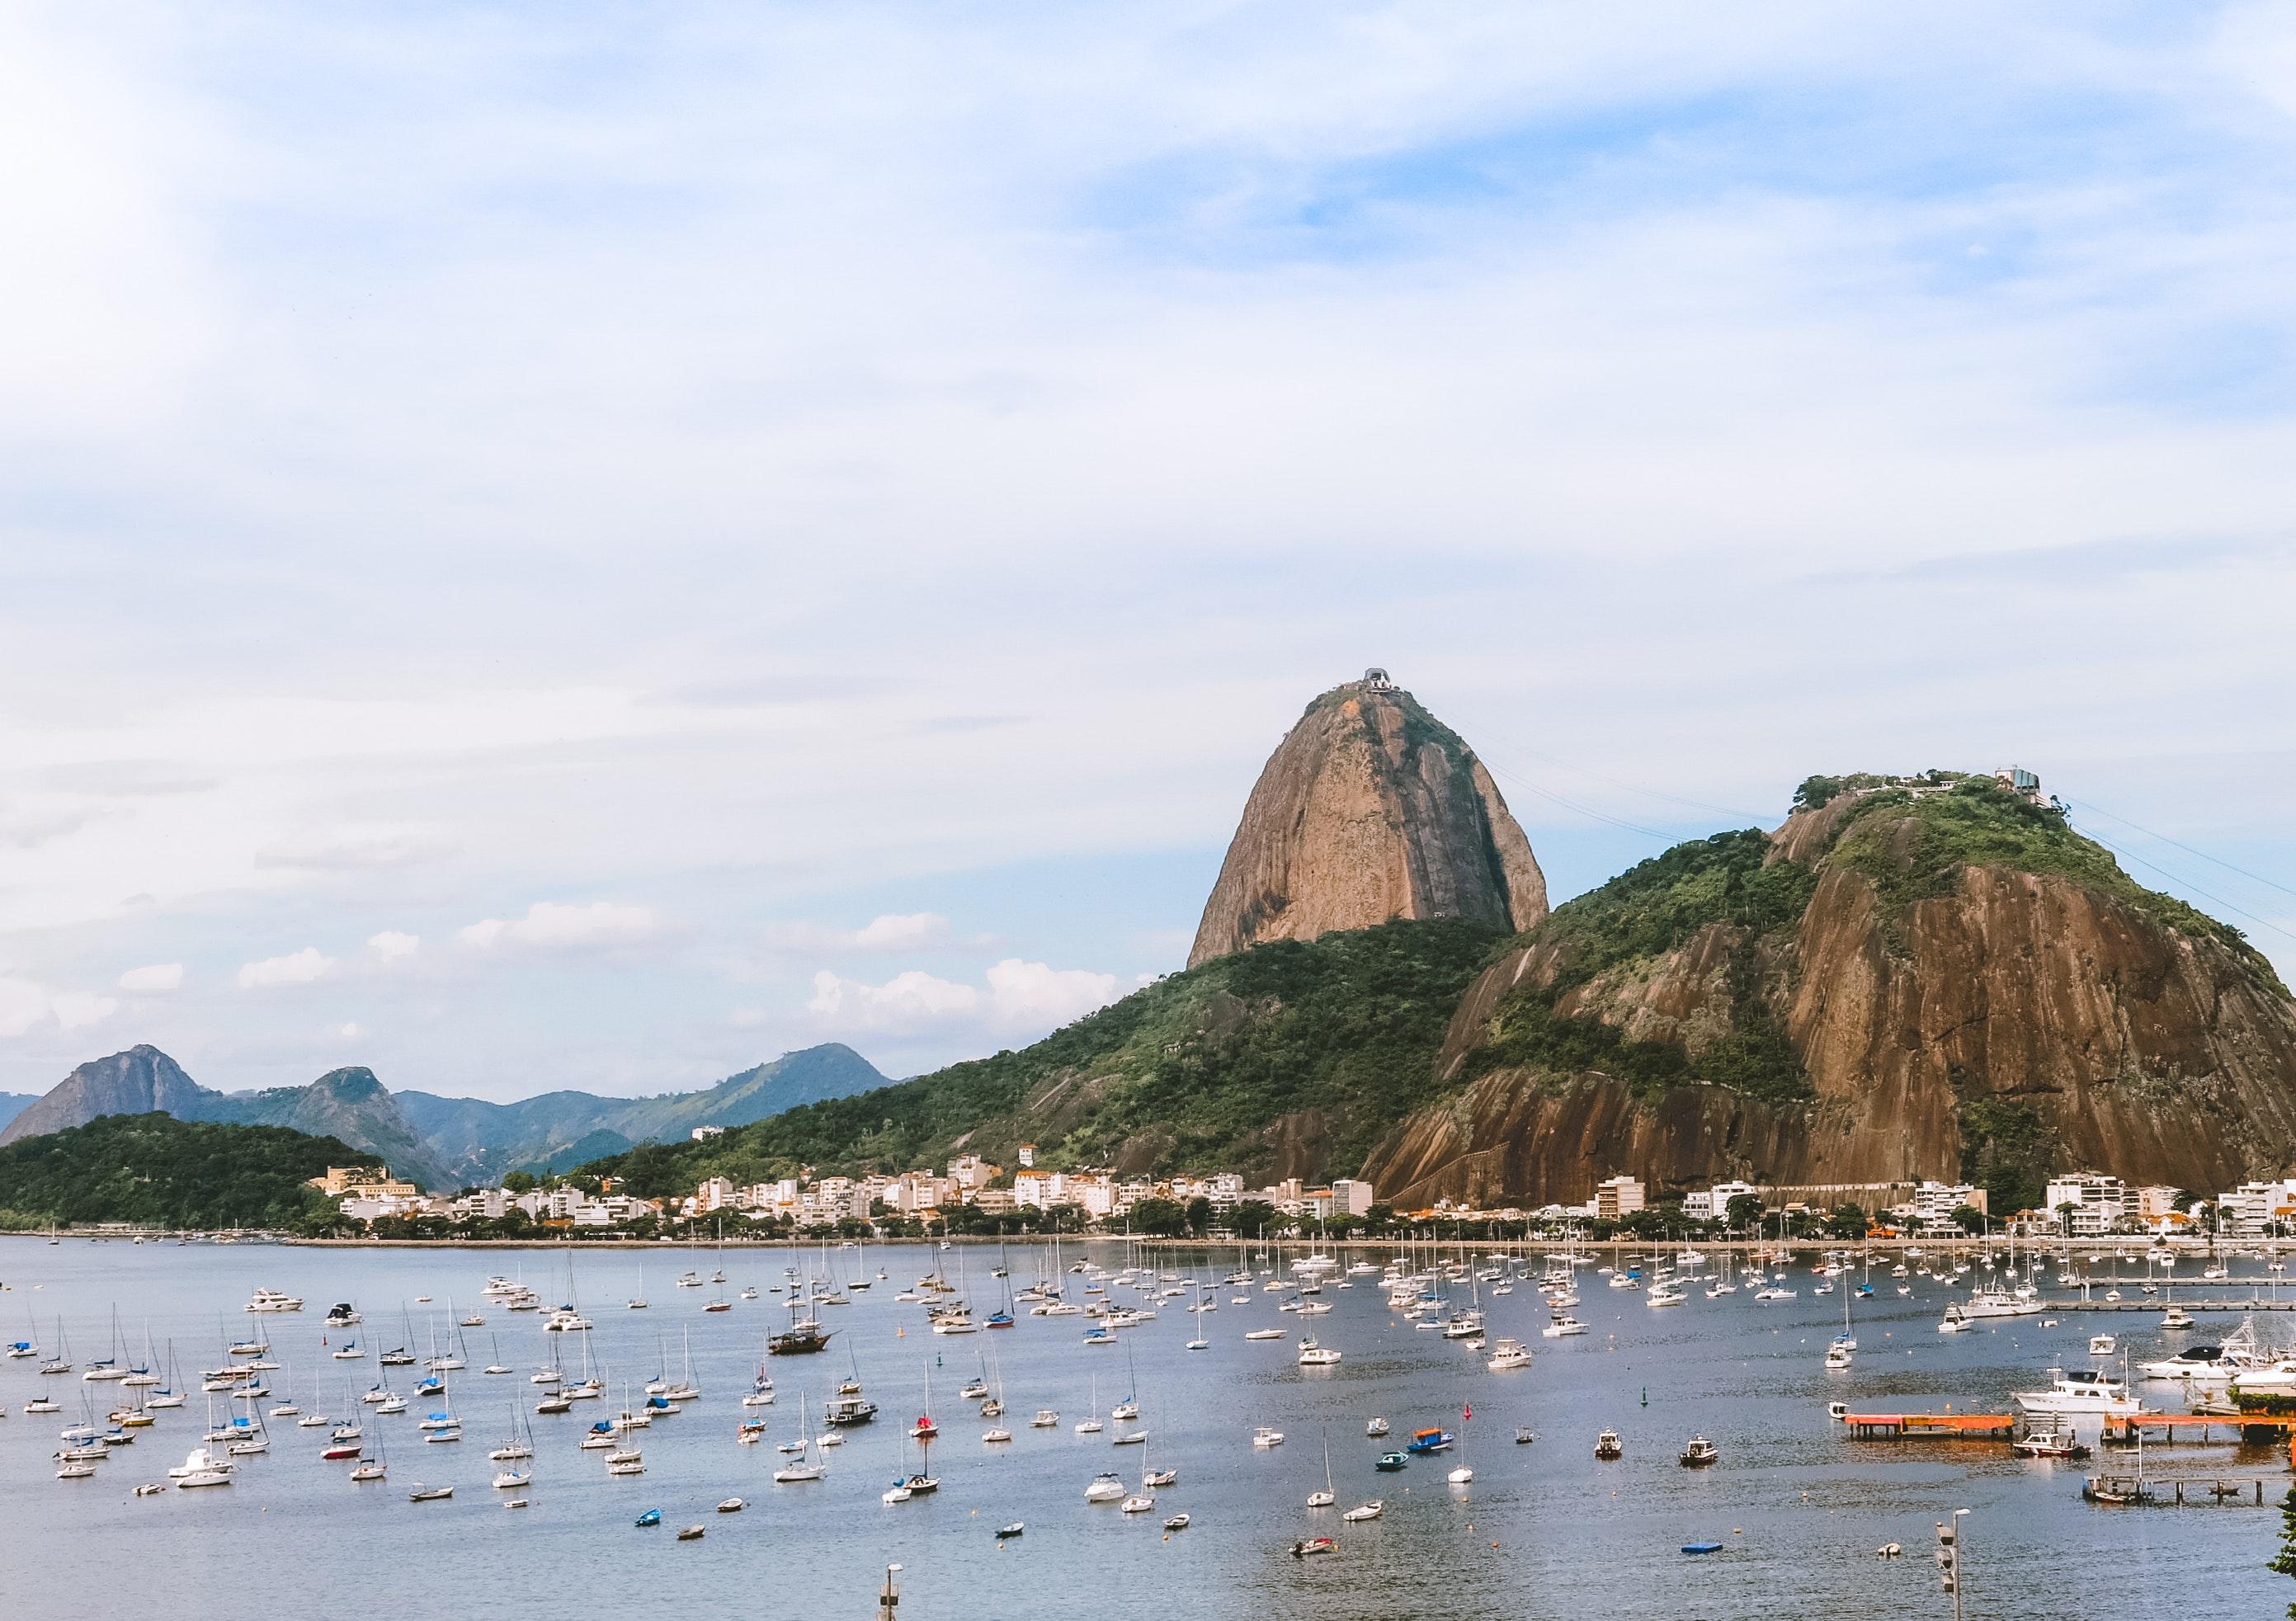 Image of Brazil Bay Beach